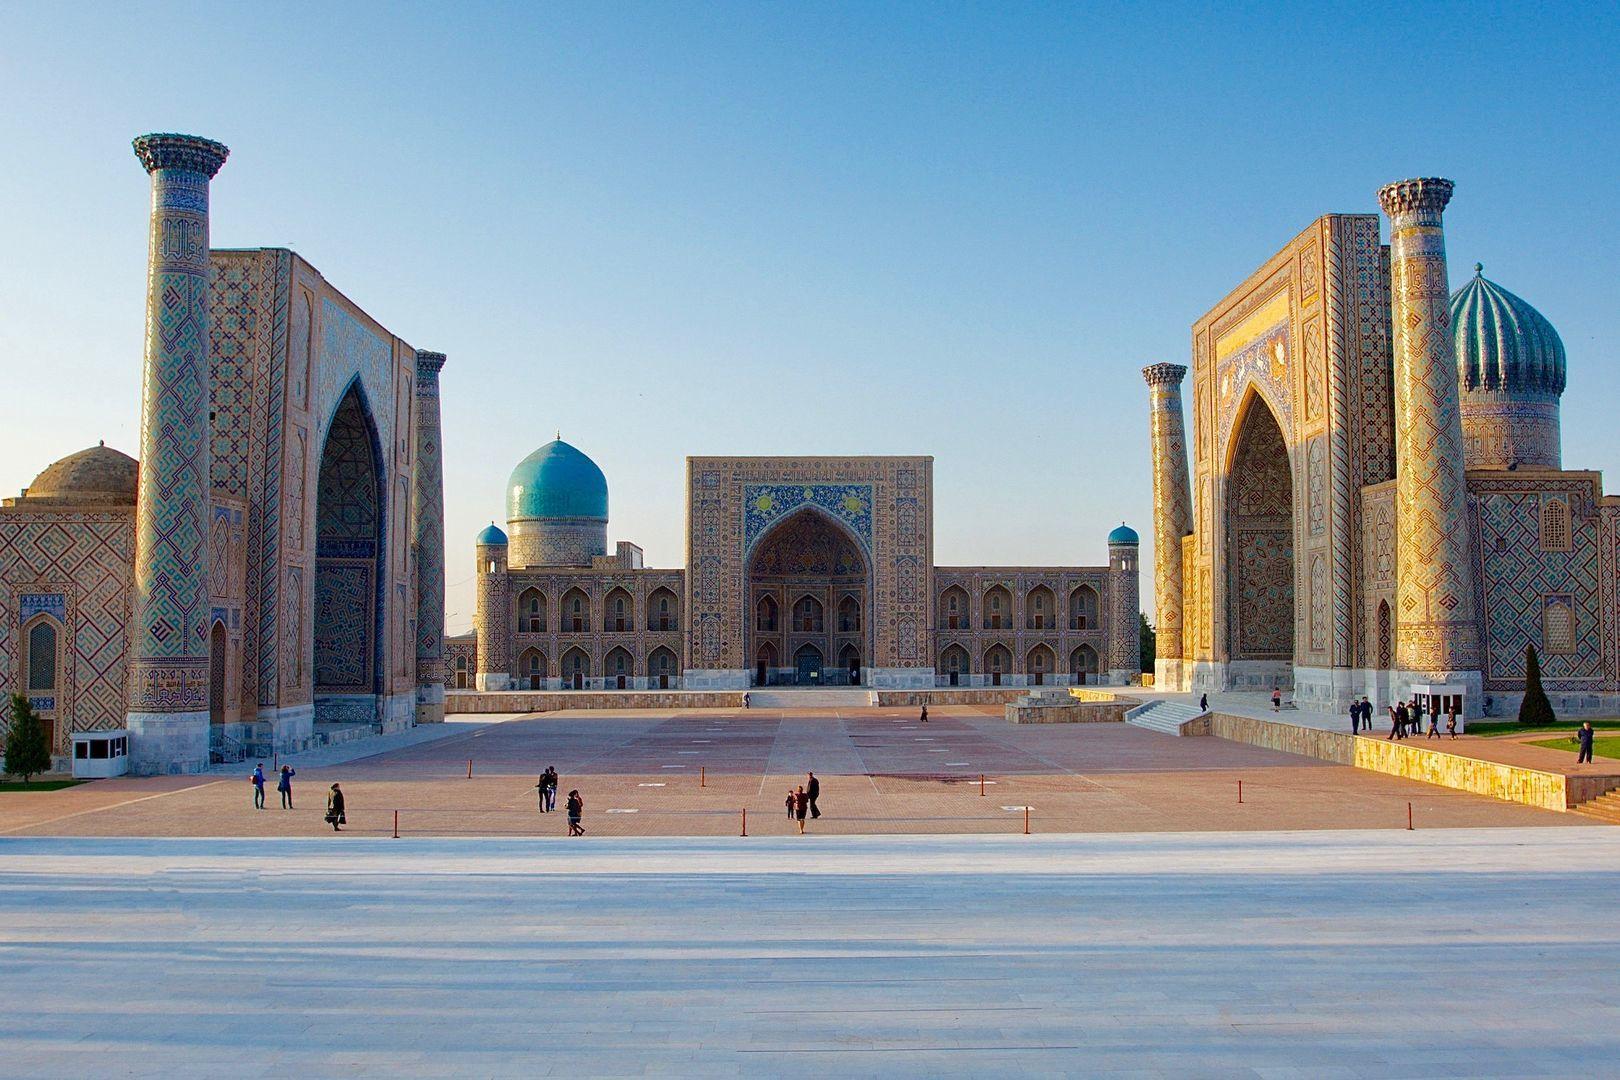 Tashkent – Samarkand (270km, ca. 2h)